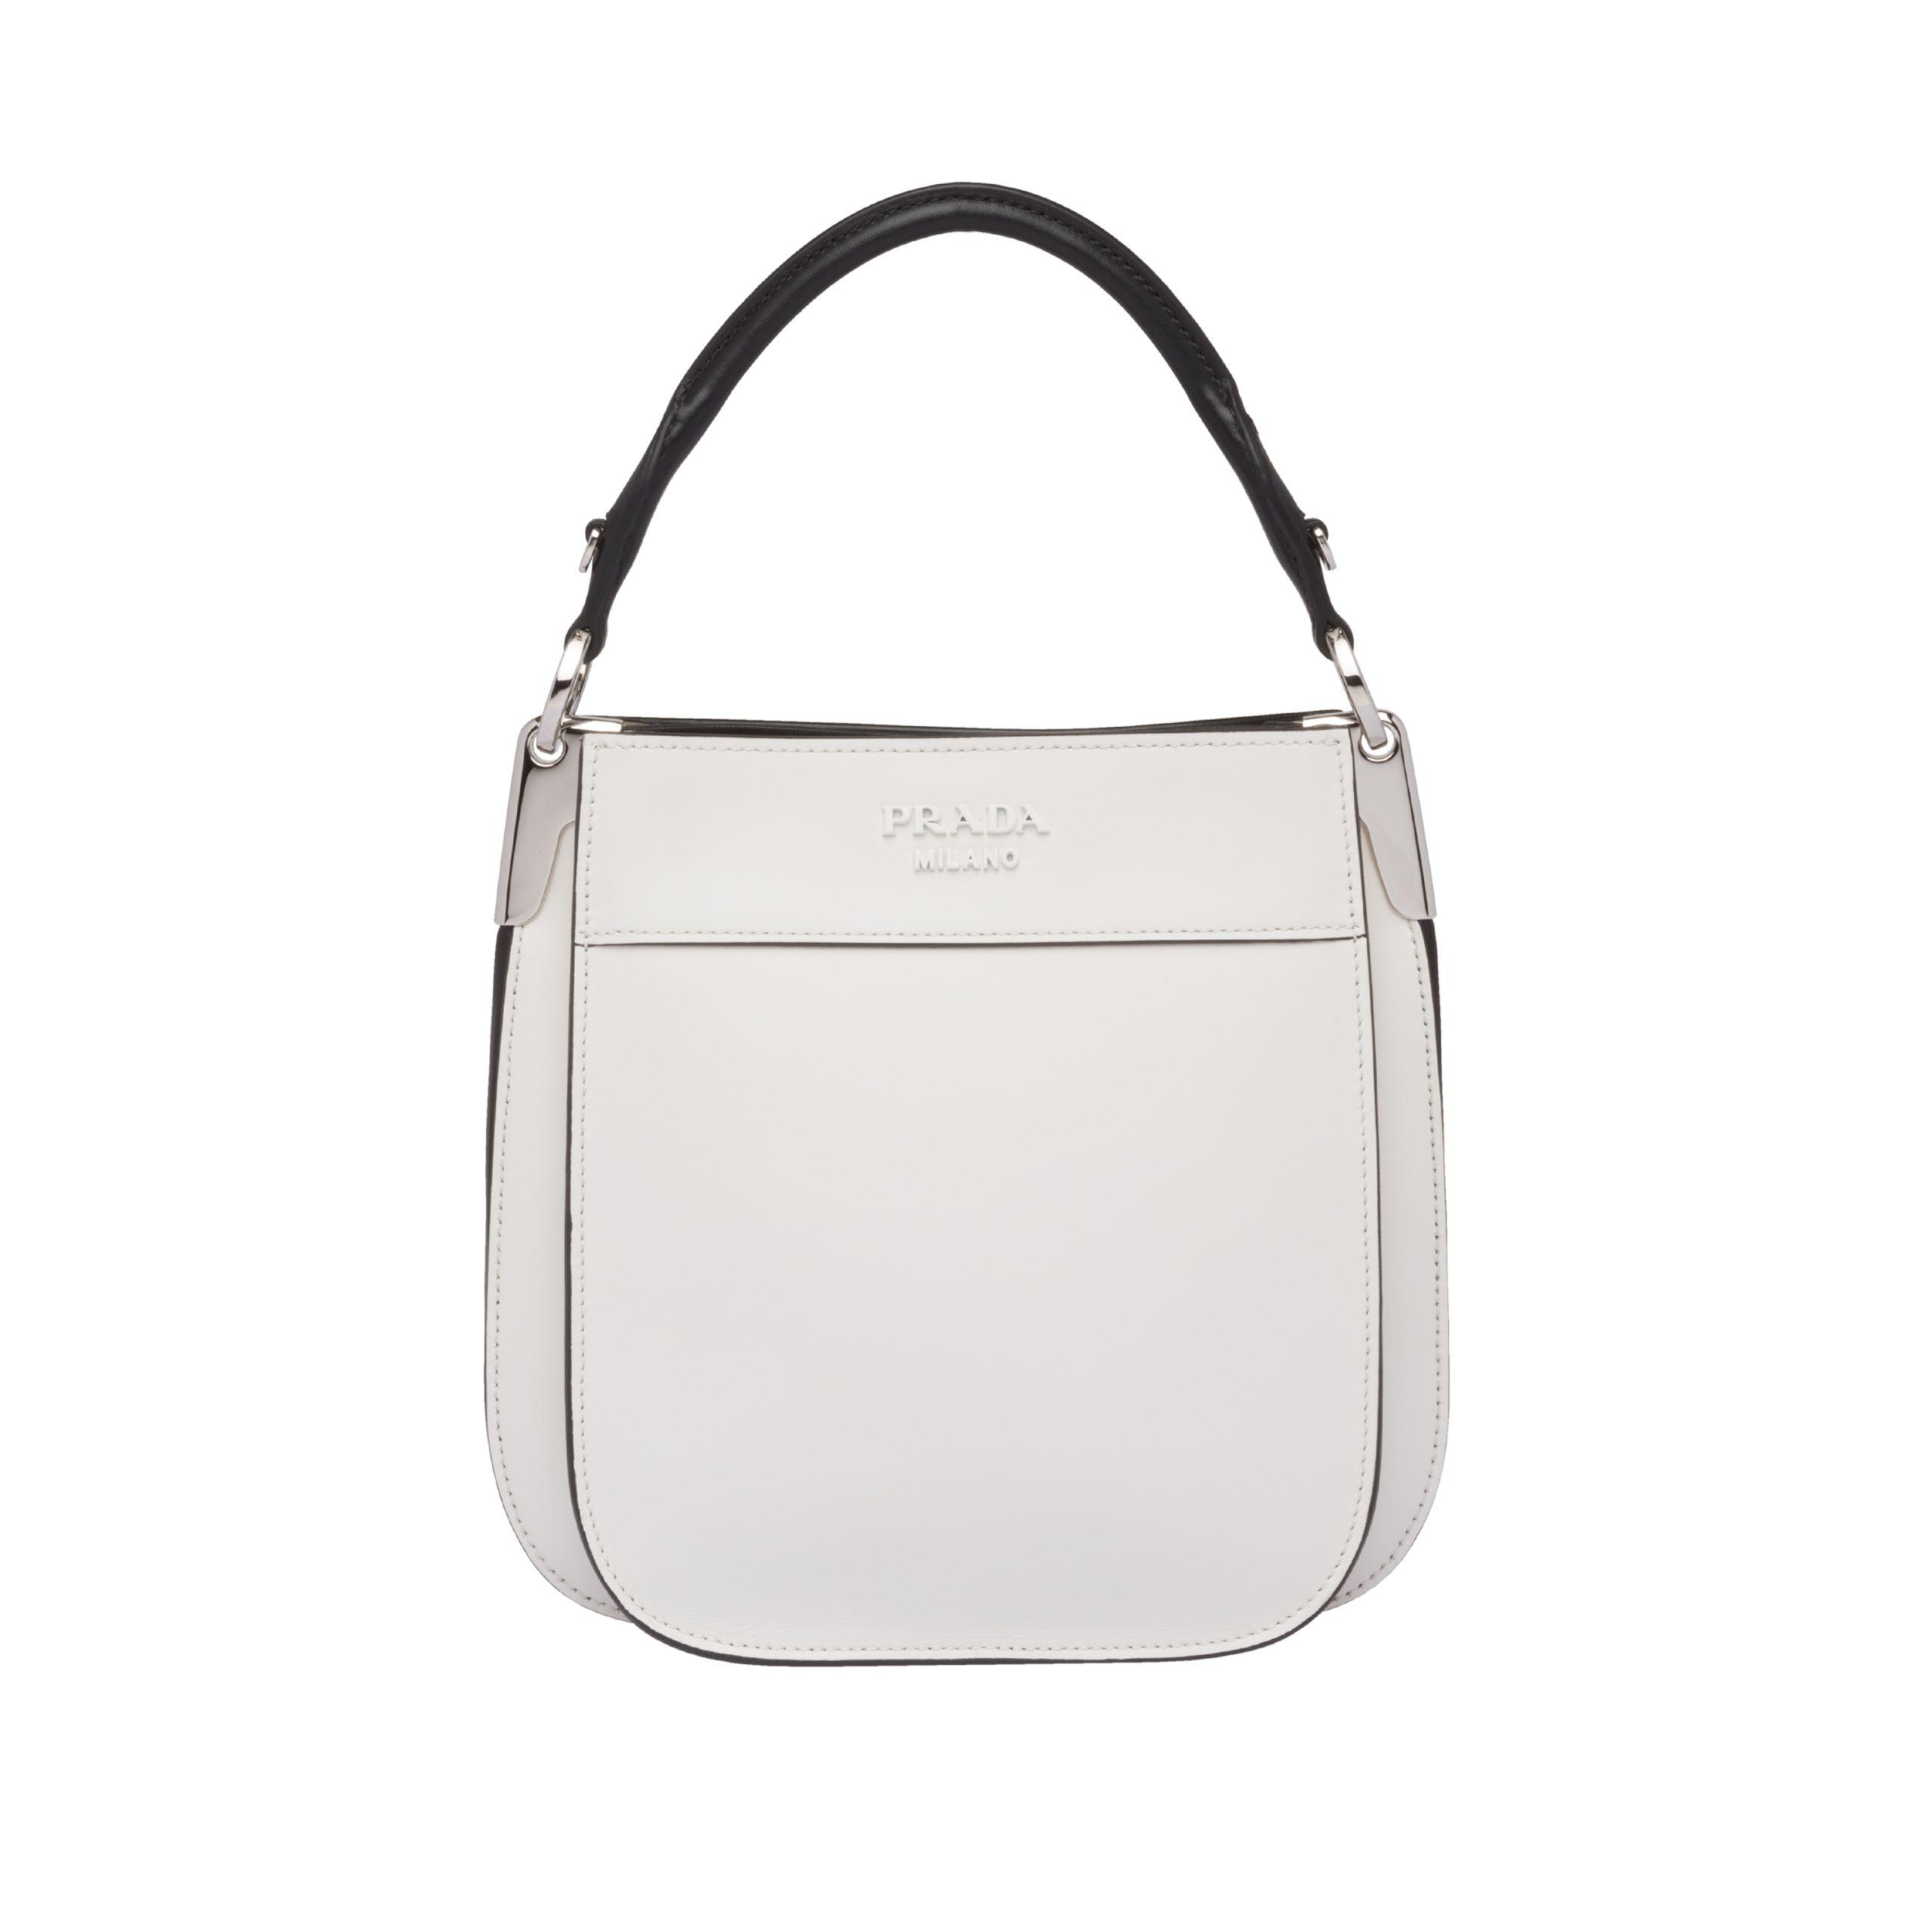 b6bb7571e4ed Prada Margit Small Leather Bag - Lyst